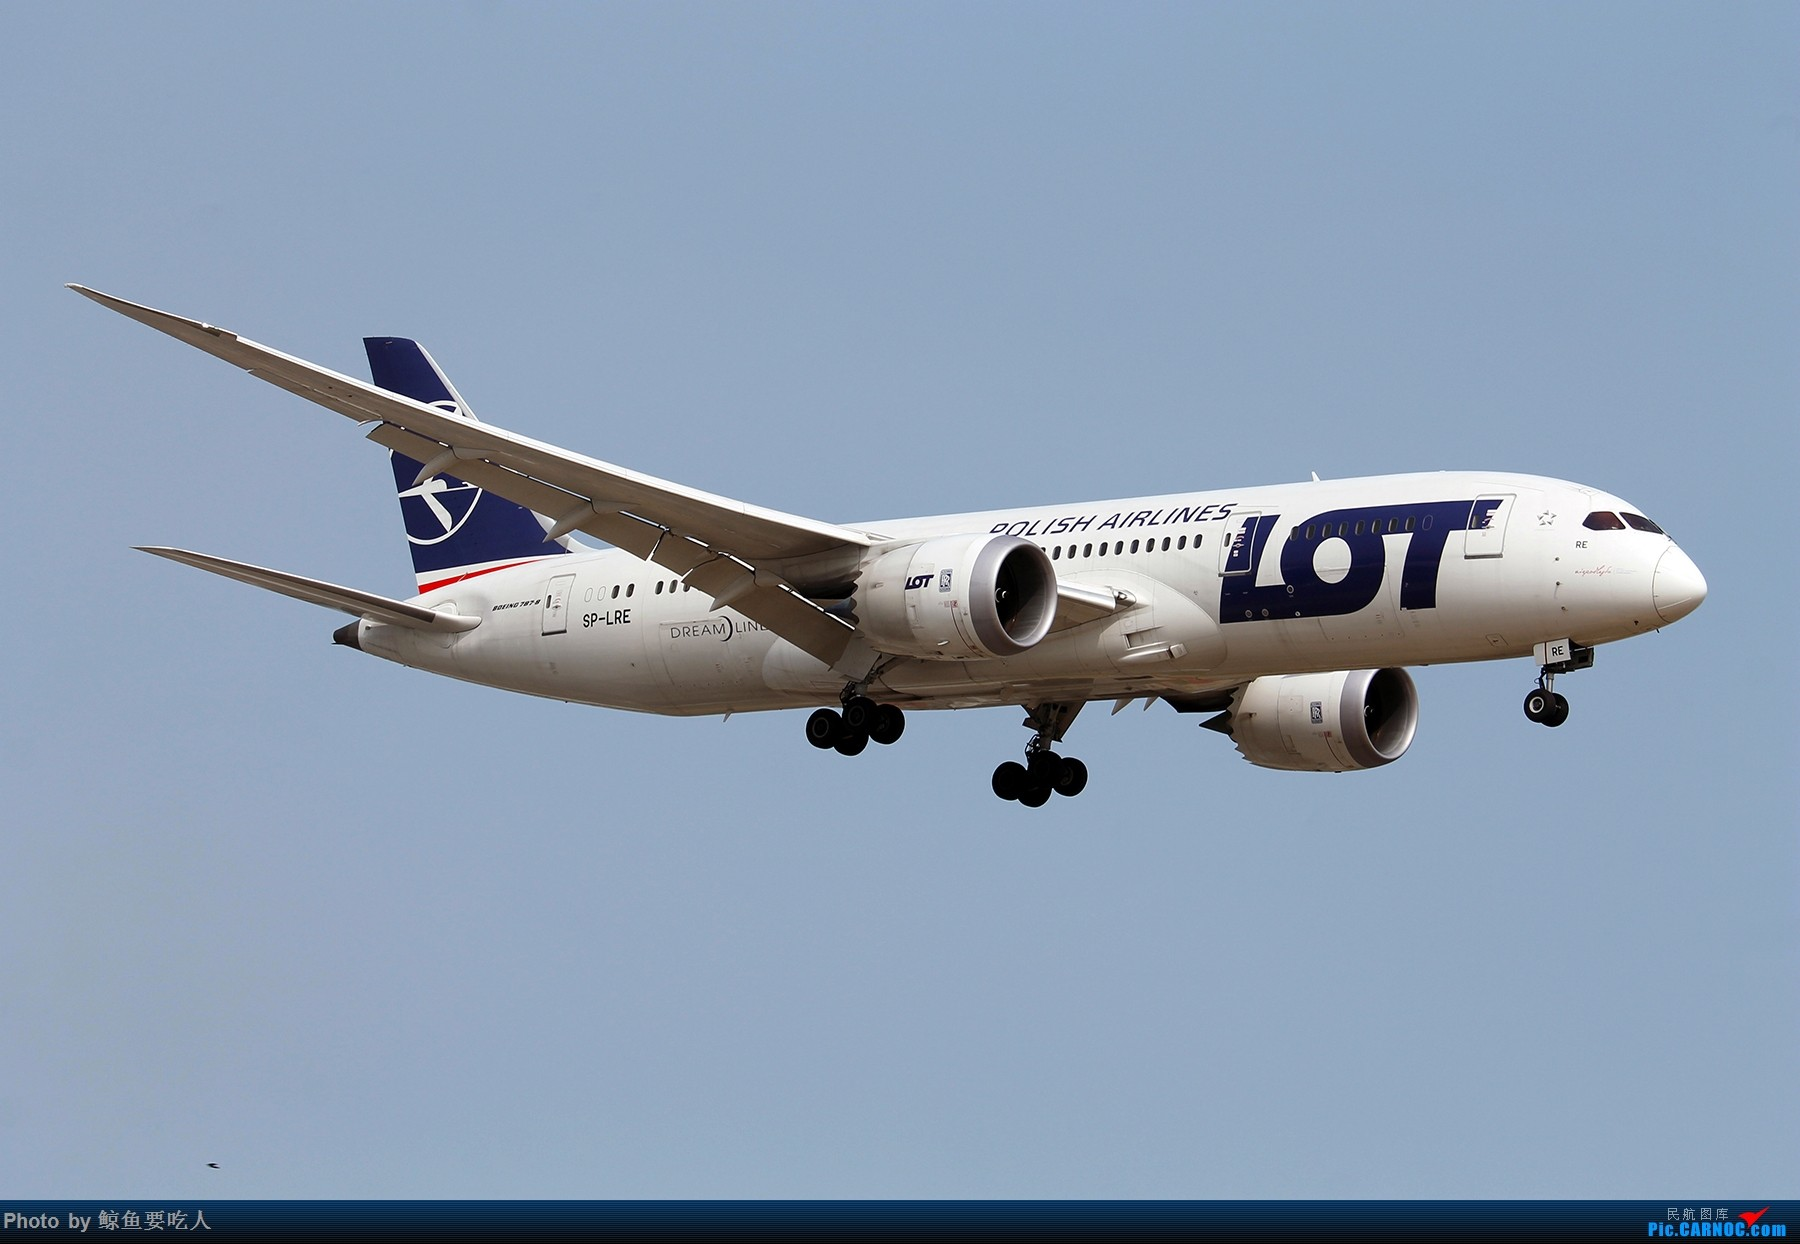 Re:[原创][Steven@YYZ] 多伦多皮尔逊国际机场晴天降落一组~~~ BOEING 787-8 SP-LRE 多伦多皮尔逊国际机场